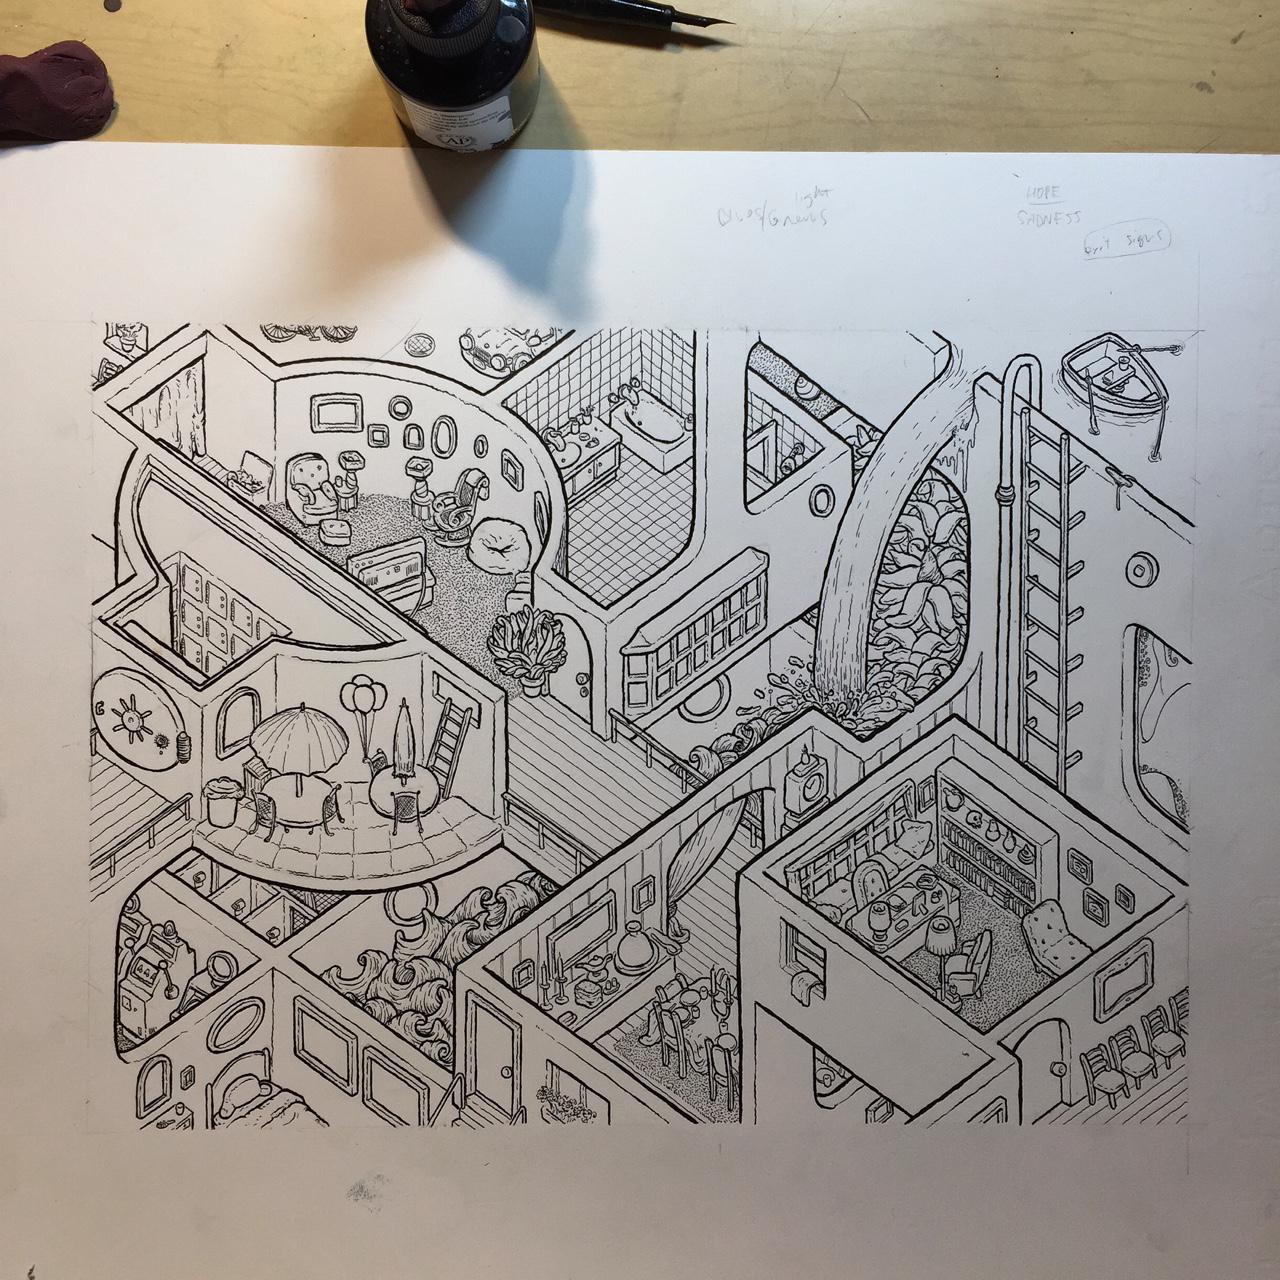 Shrink's Office (progress)